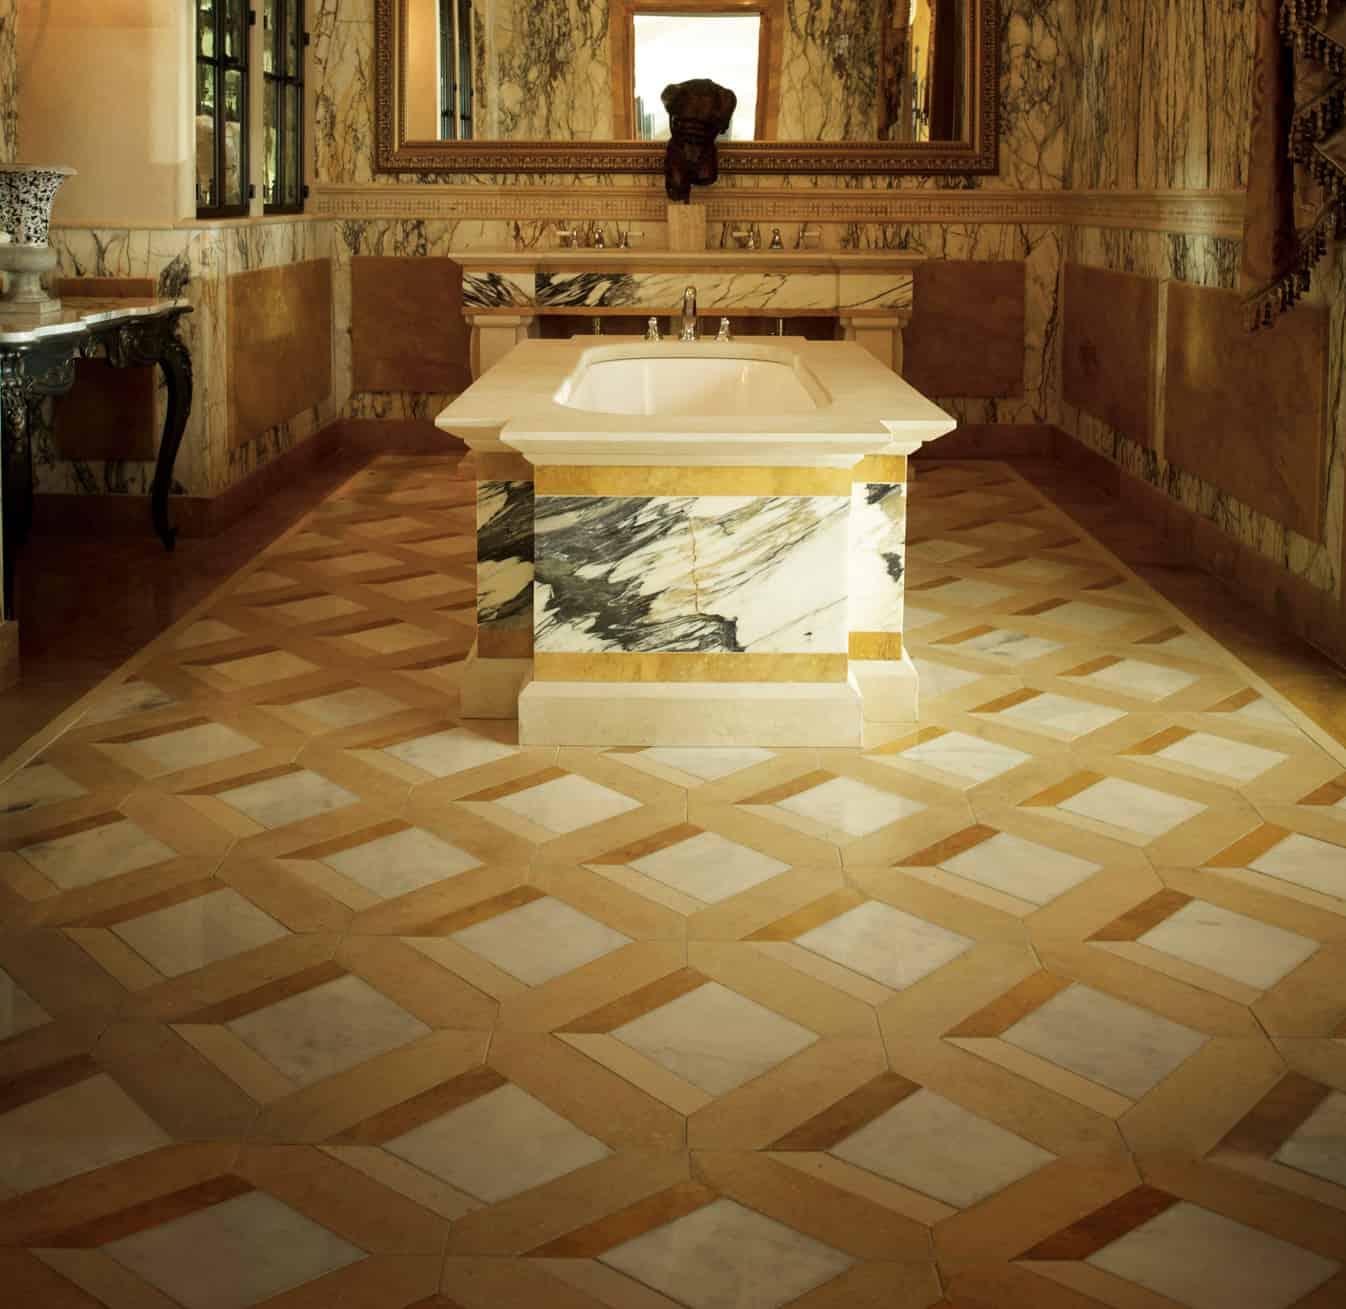 Granite Floor Tiles Design Contemporary Tile Design Ideas From Around The World